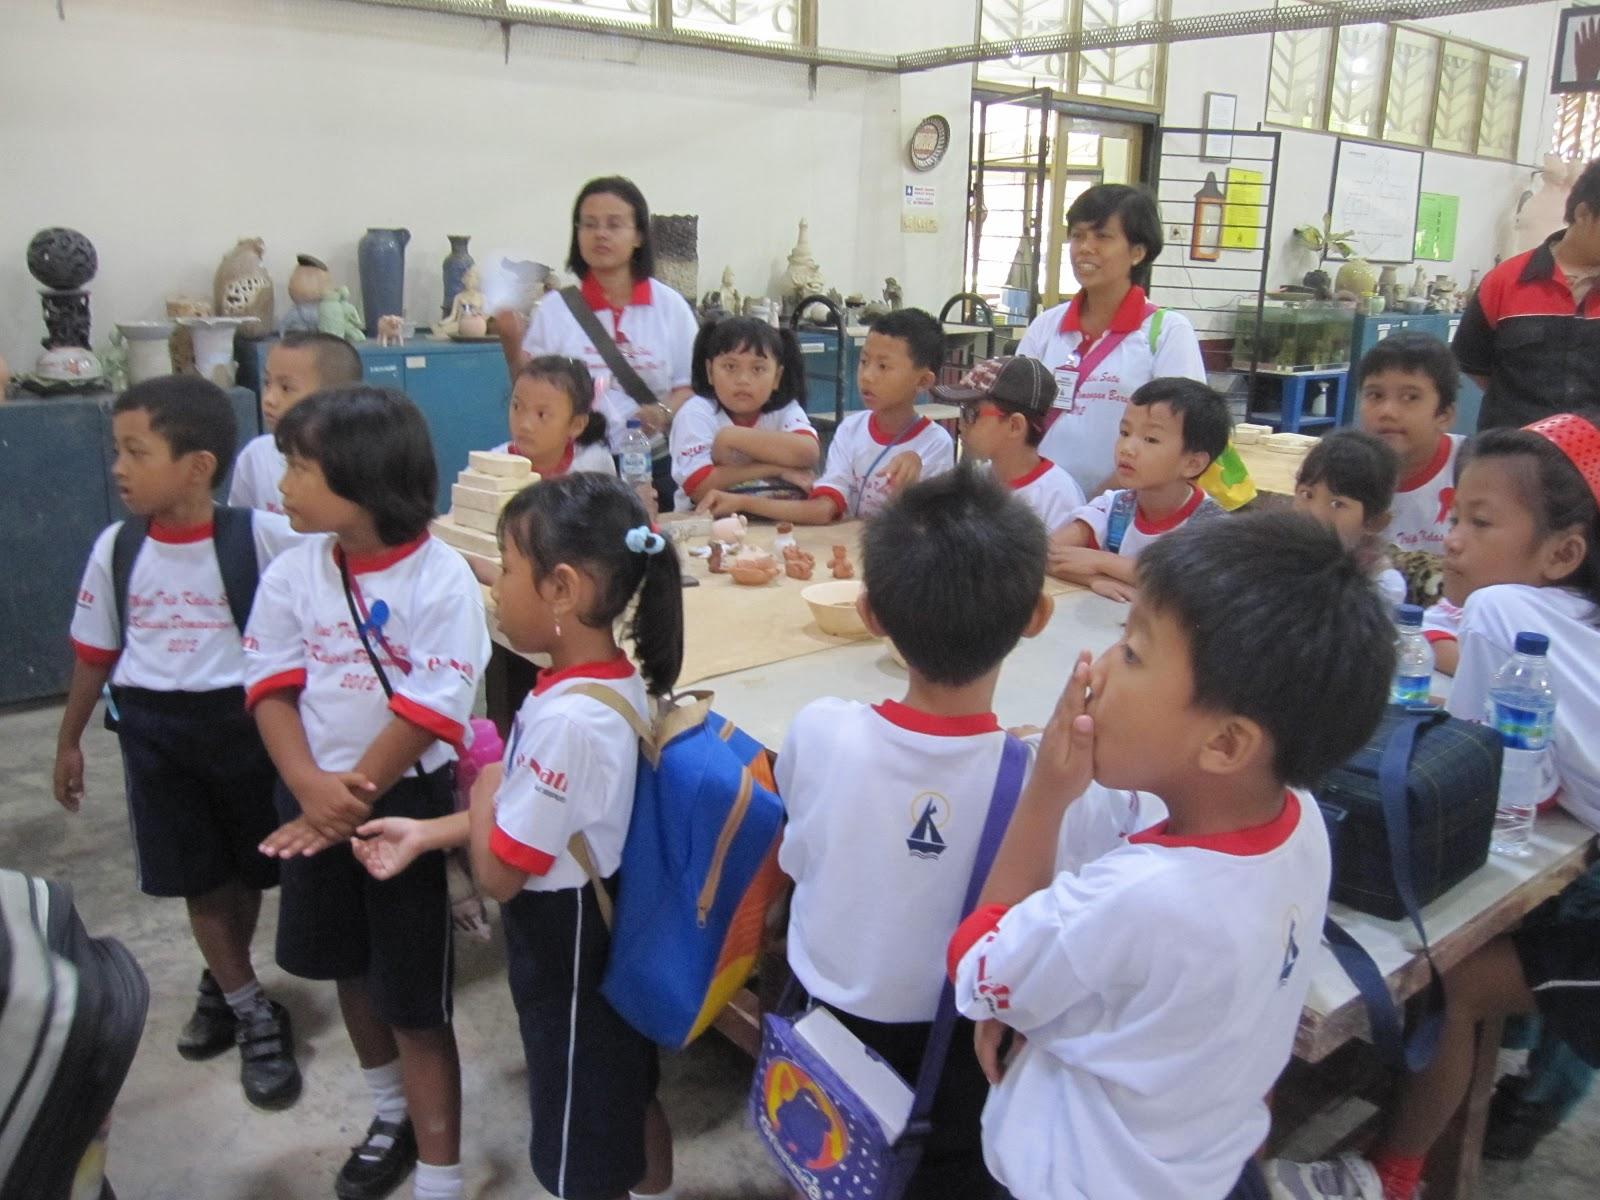 Dan anak-anak pun gembira membuat boneka keramik